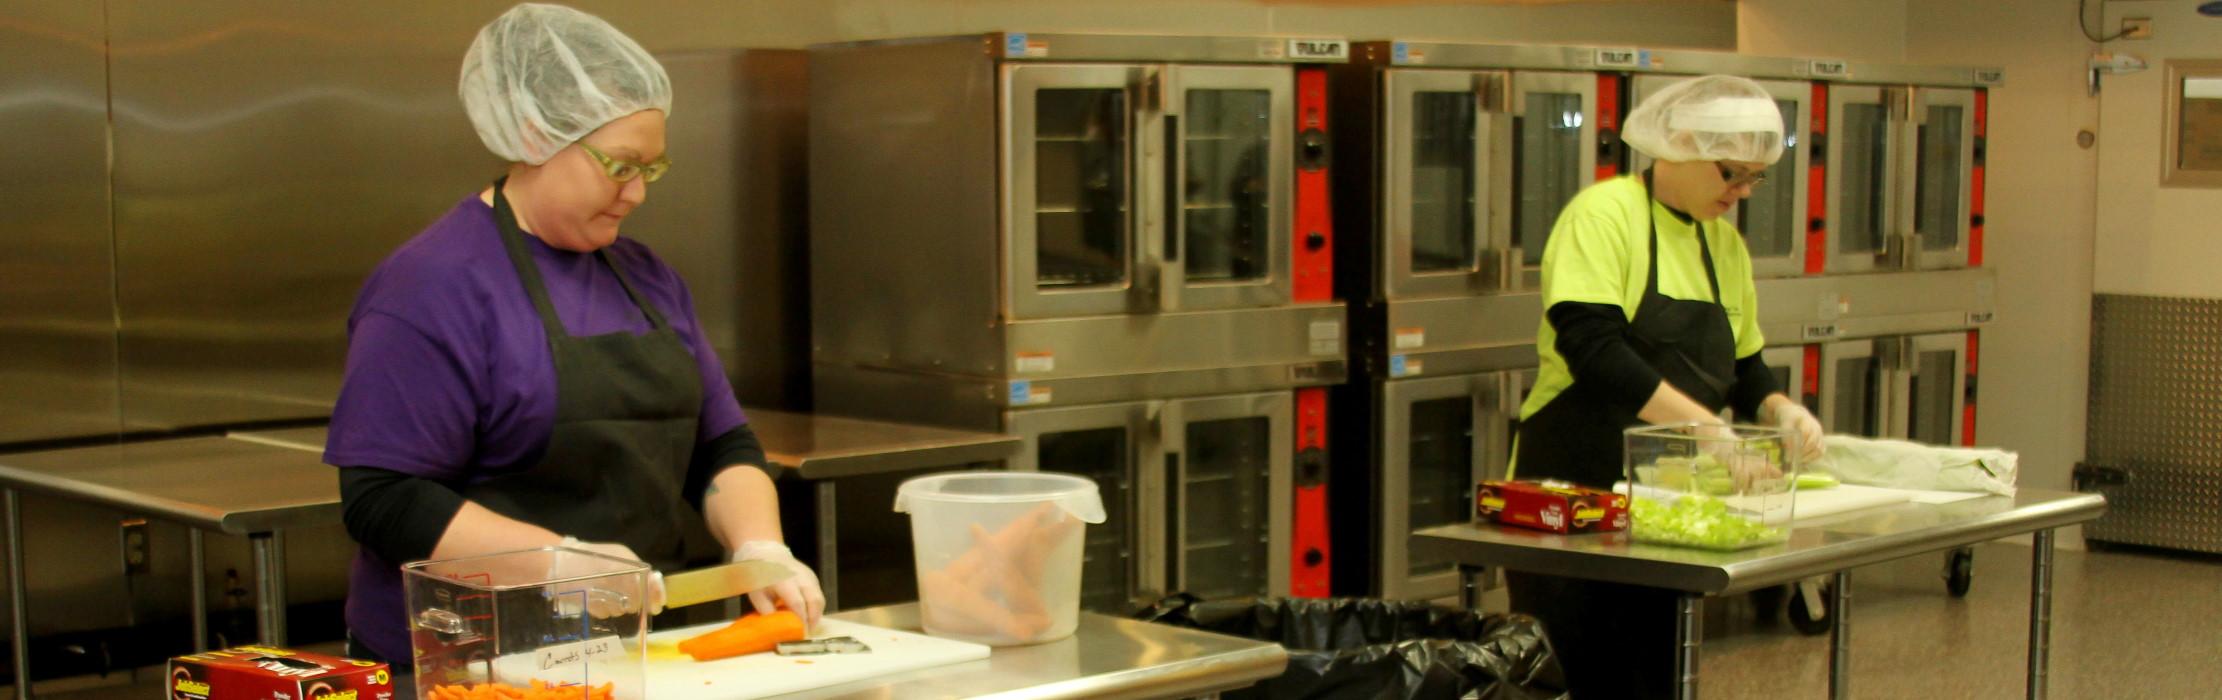 Food preparation in an industrial kitchen.